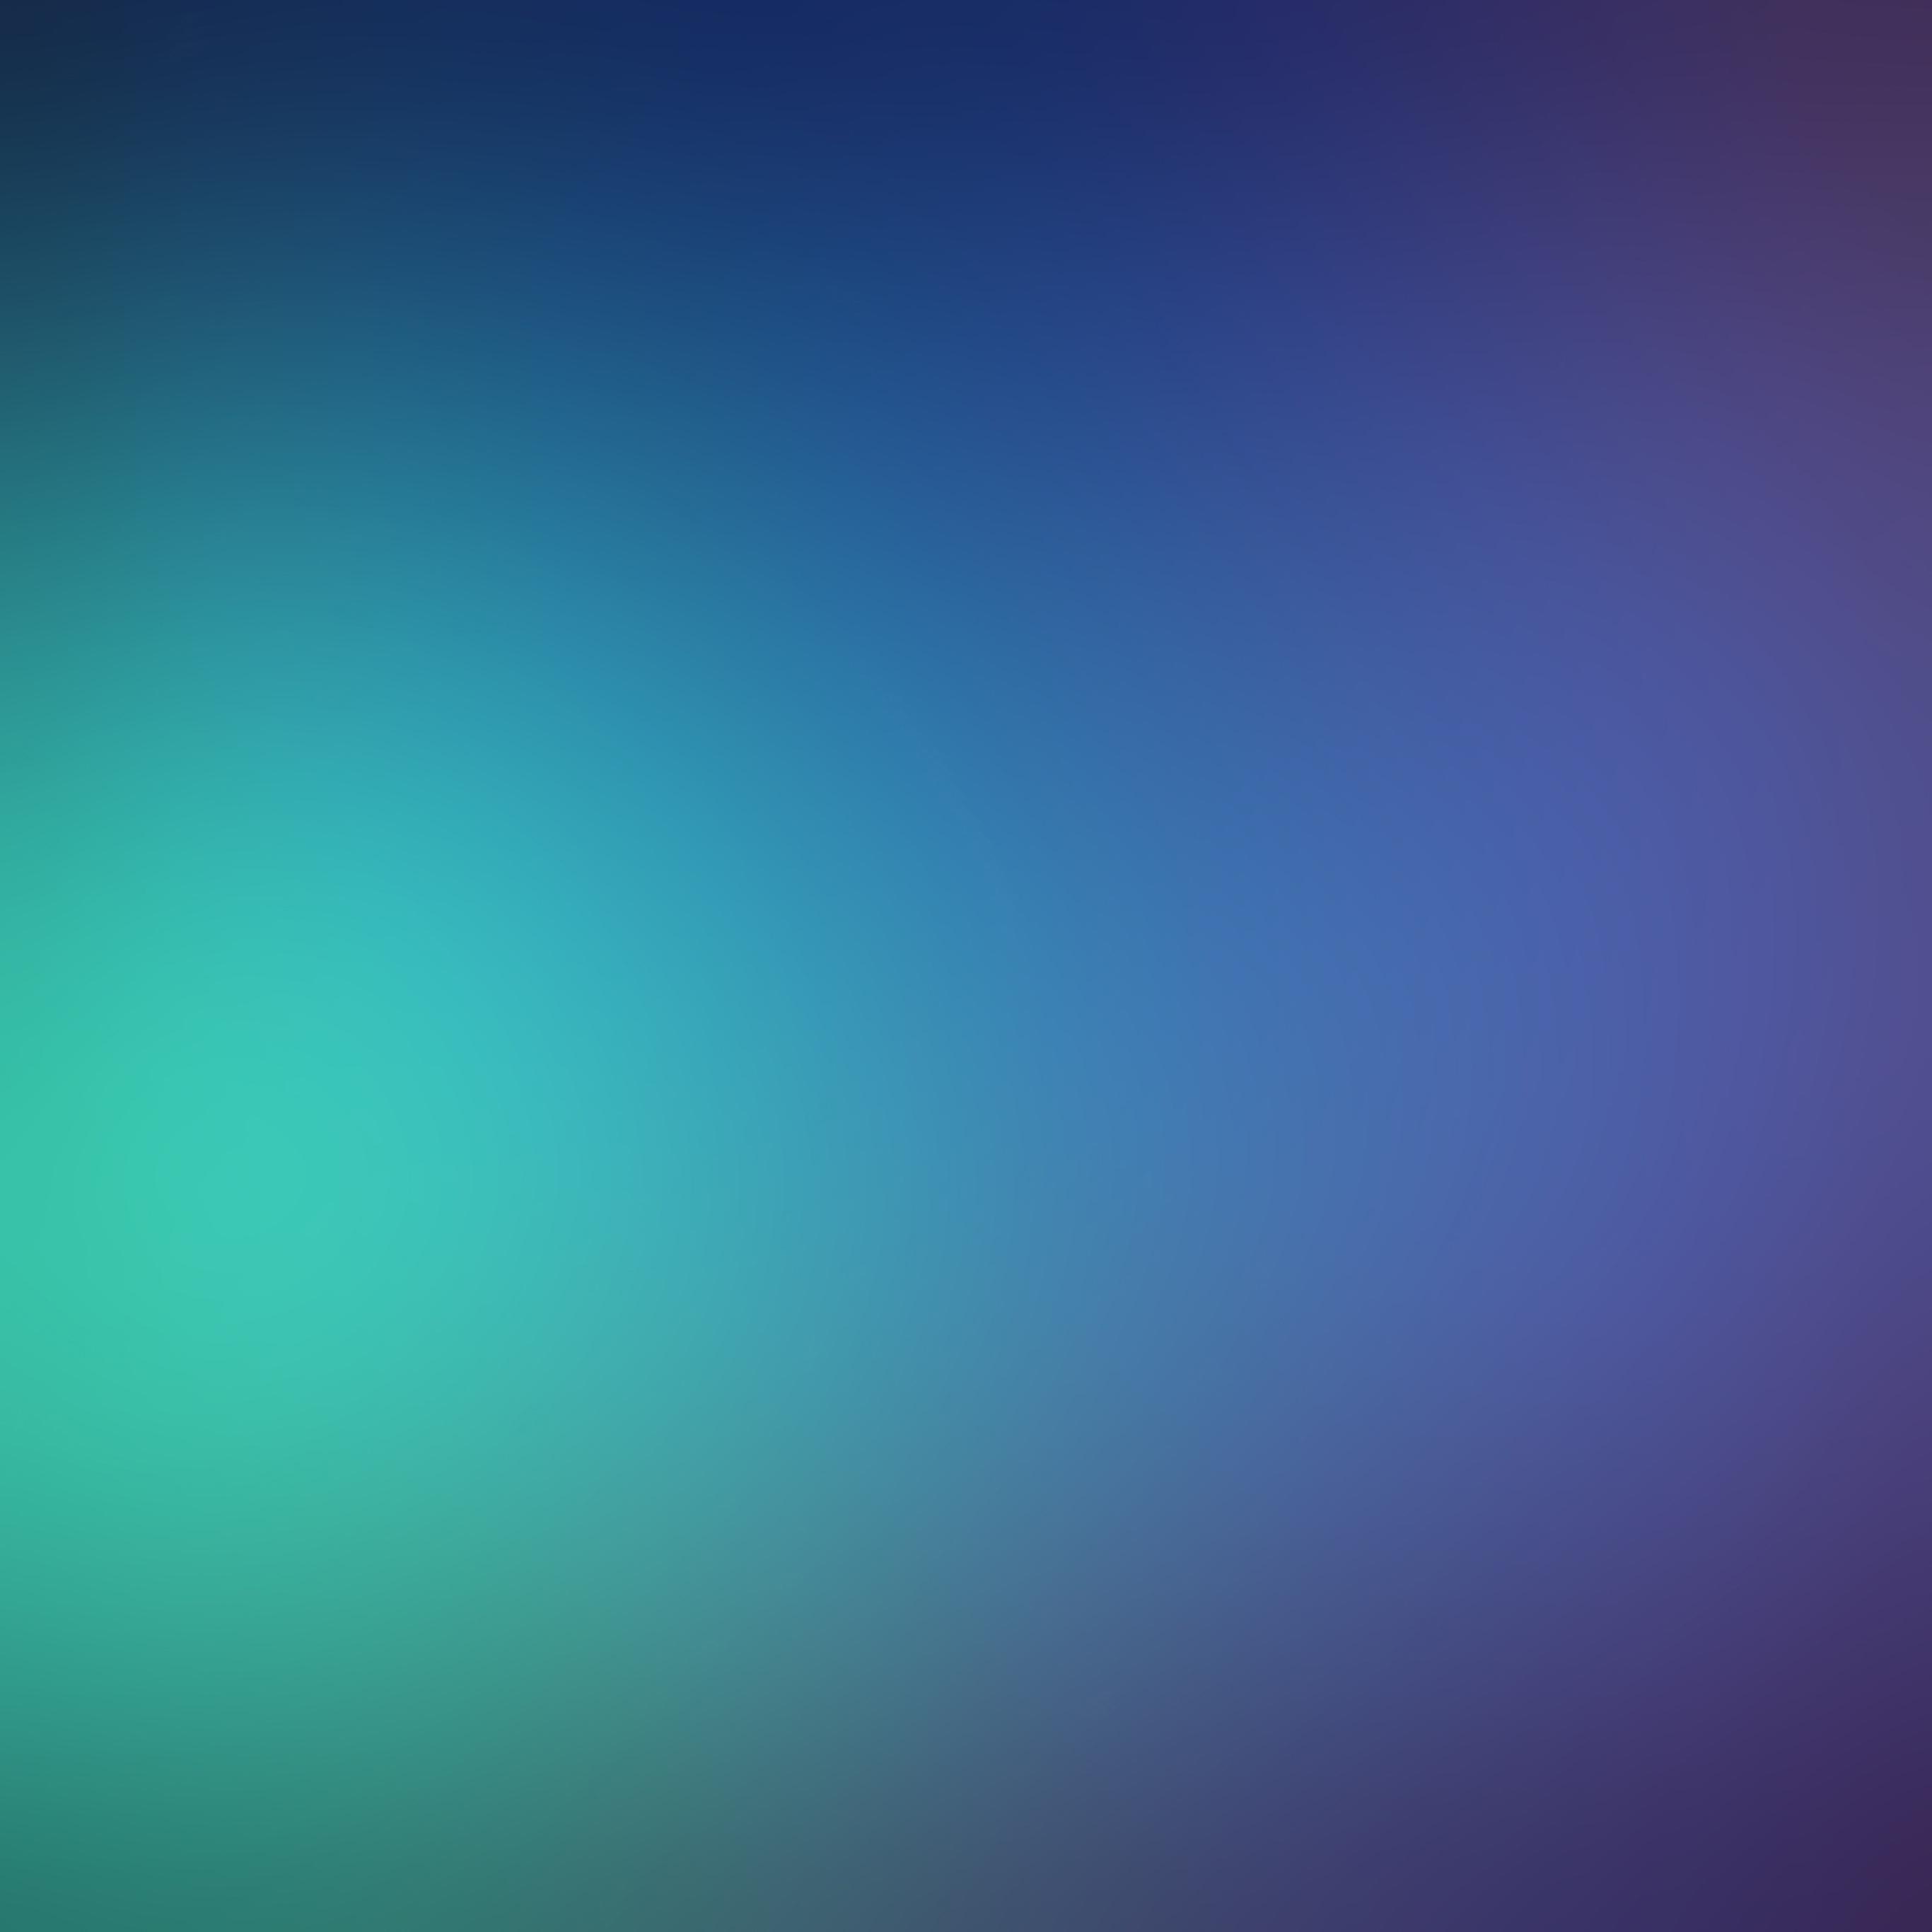 Wallpaper Blurry Iphone X Sd69 Blue Windows Green Gradation Blur Papers Co